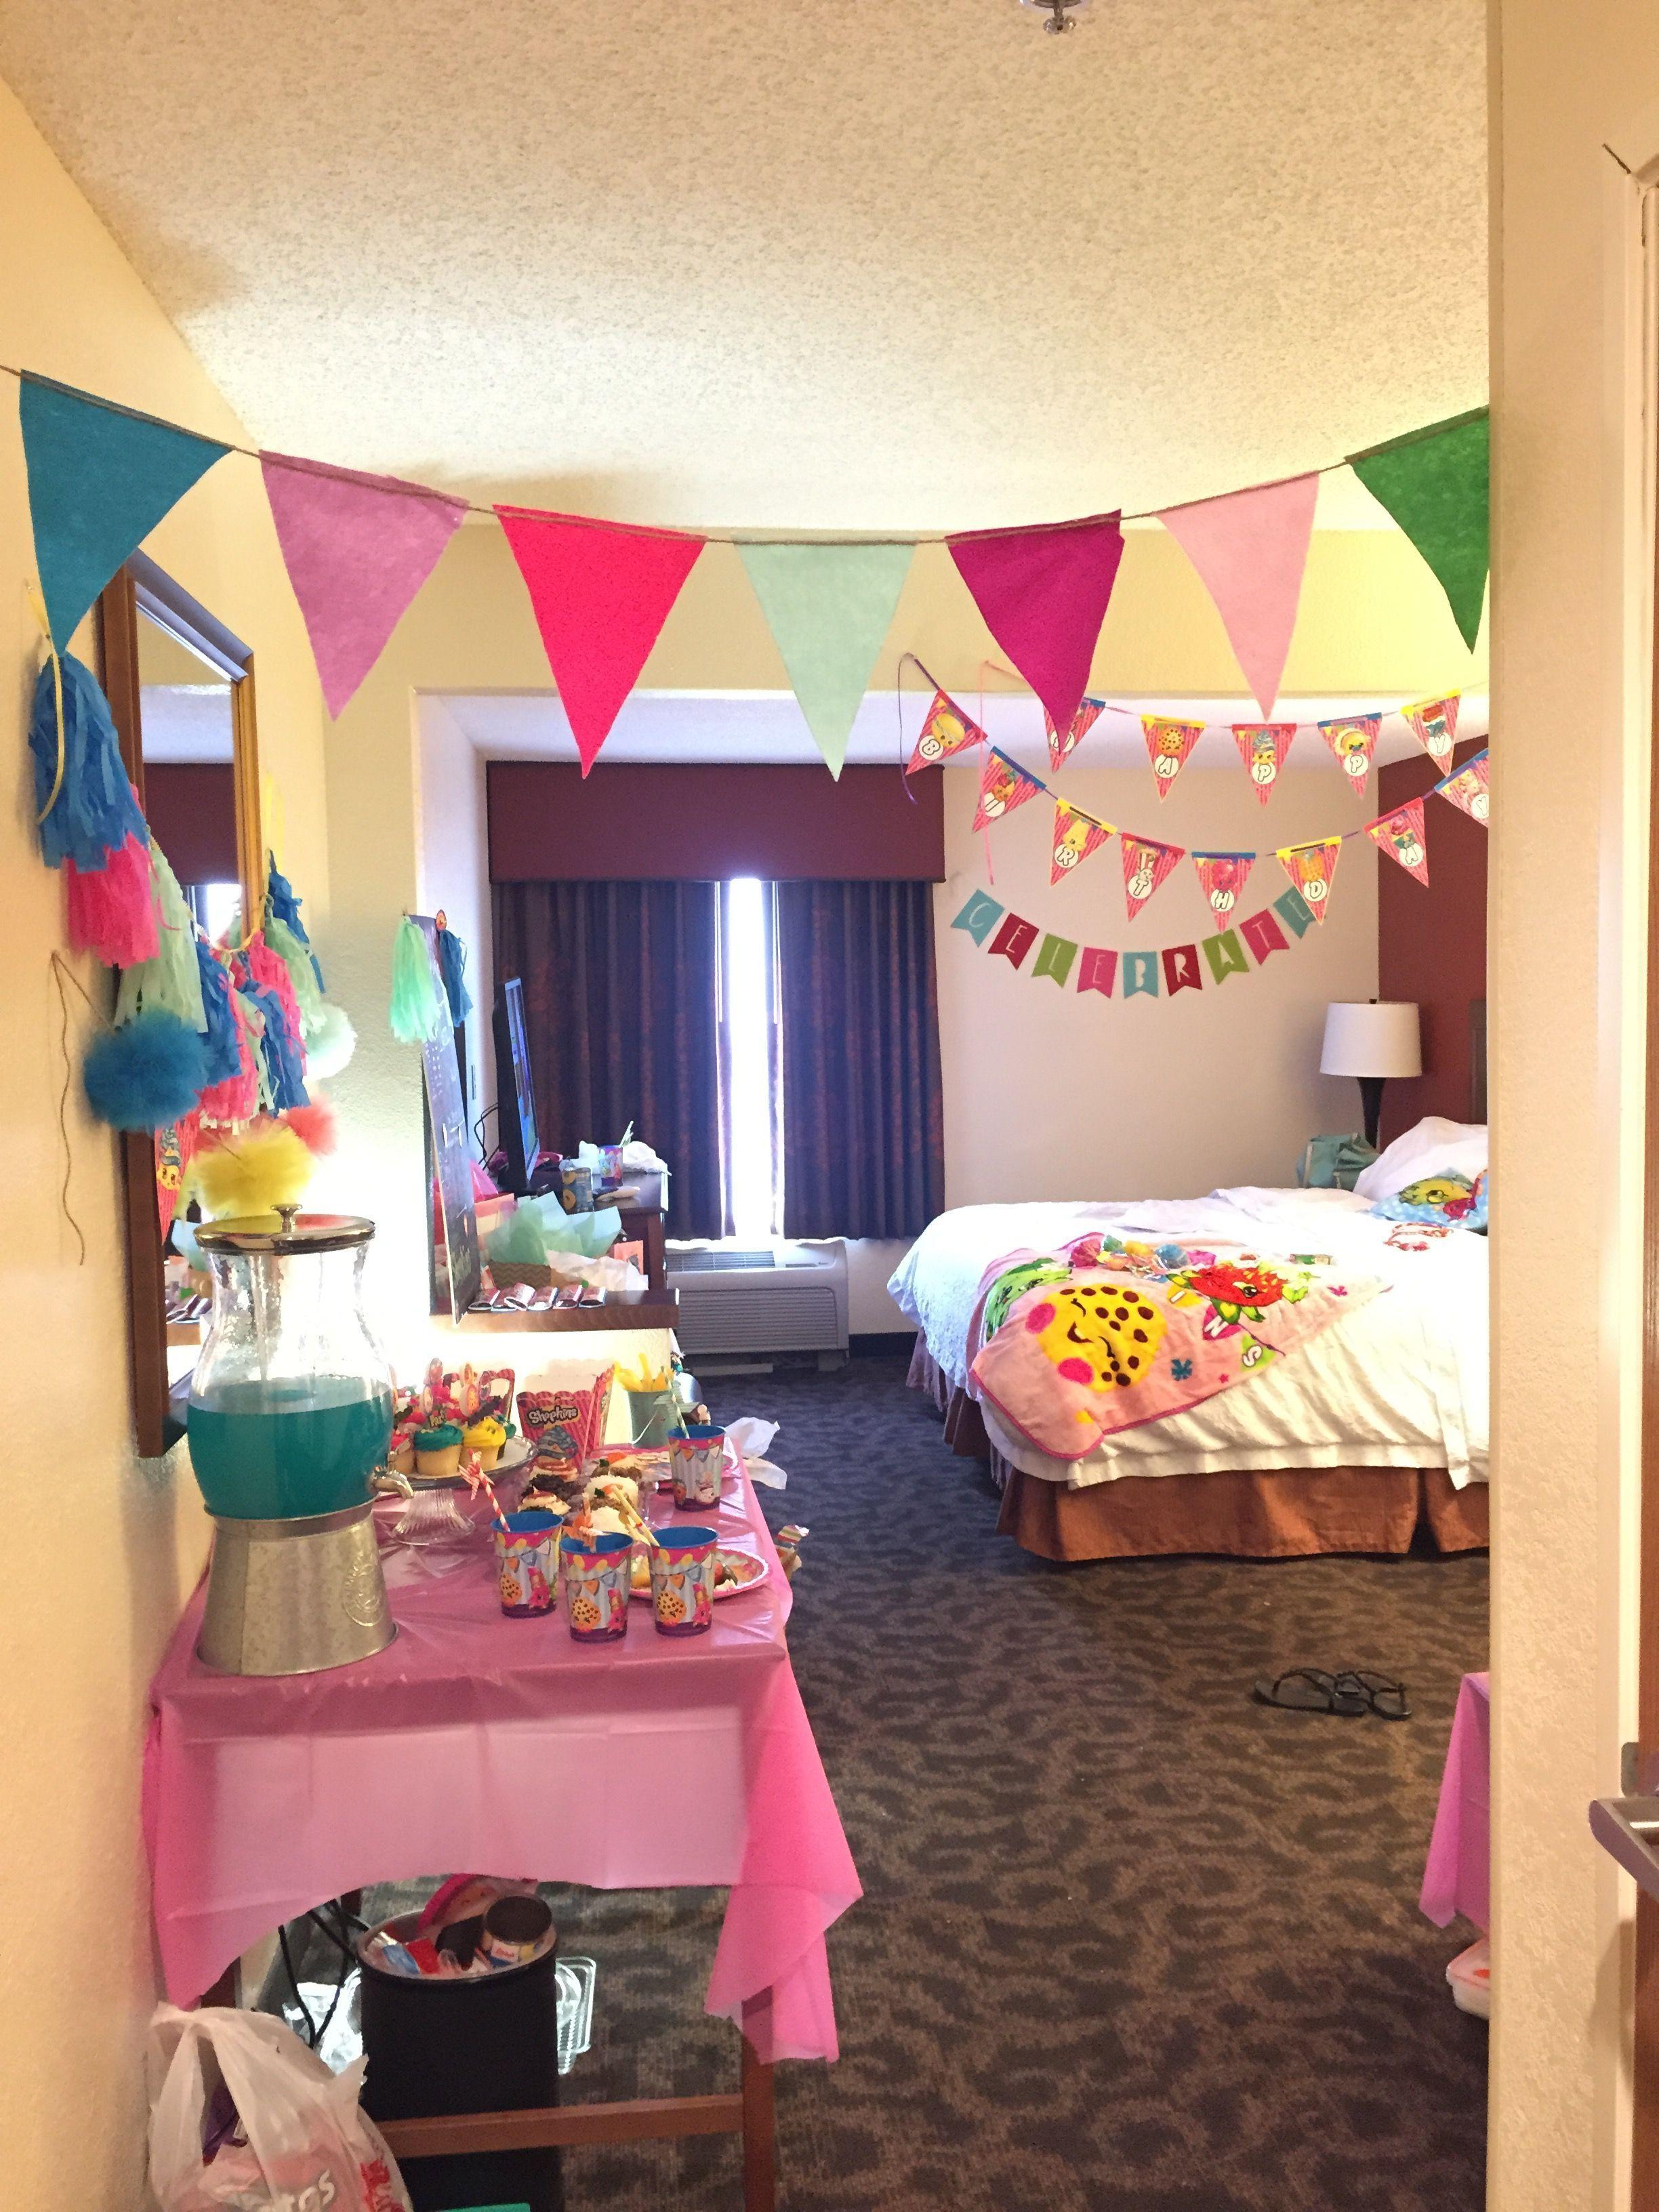 Hotel Room Decoration: 20+ Birthday Party Idea Will Not Be Forgotten